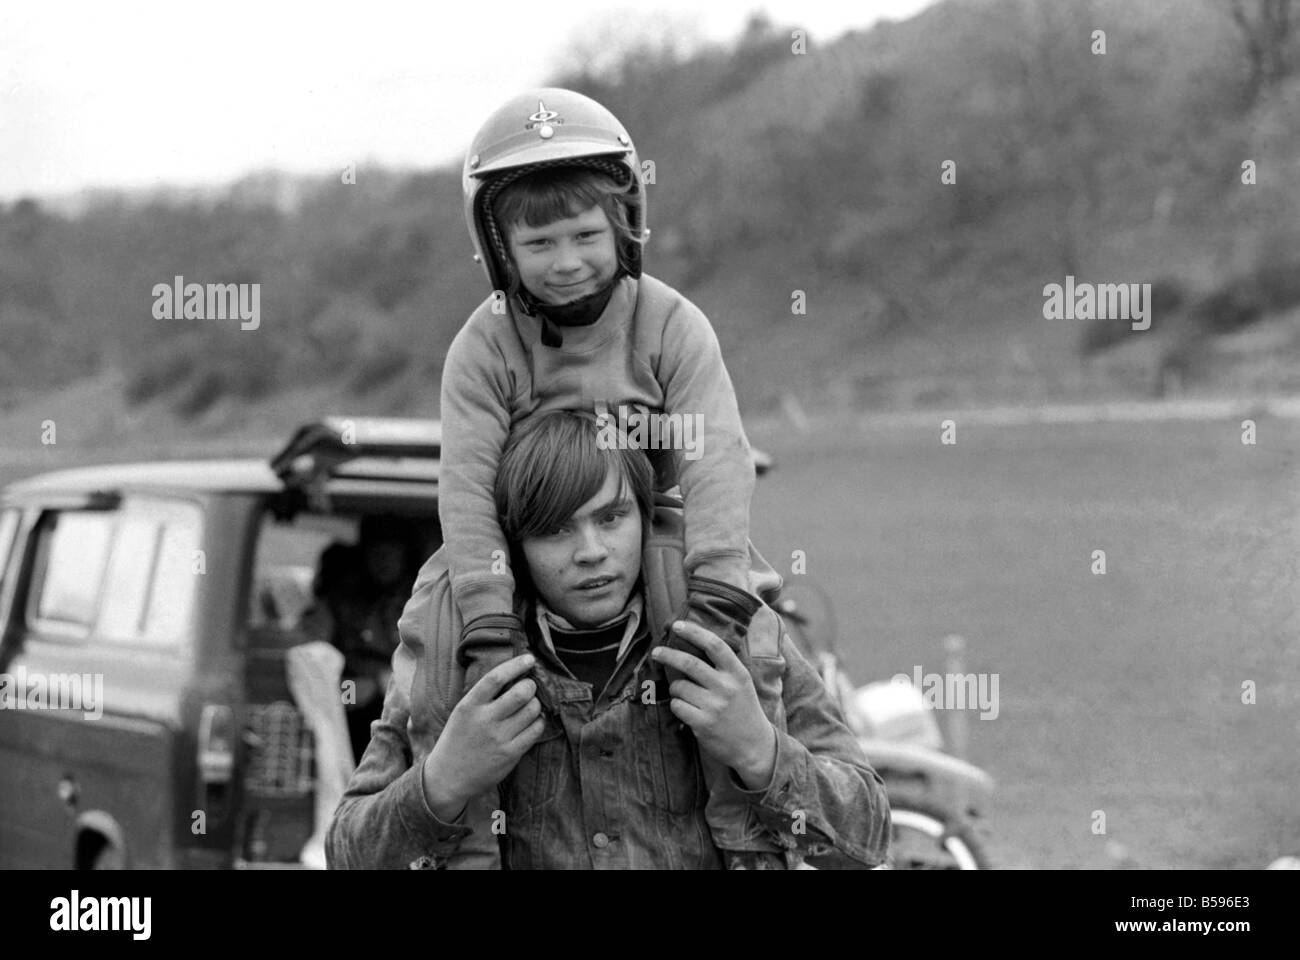 Motorsport/Children/Motorbike: Schoolboys Scramble. March 1975 75-01212-022 - Stock Image